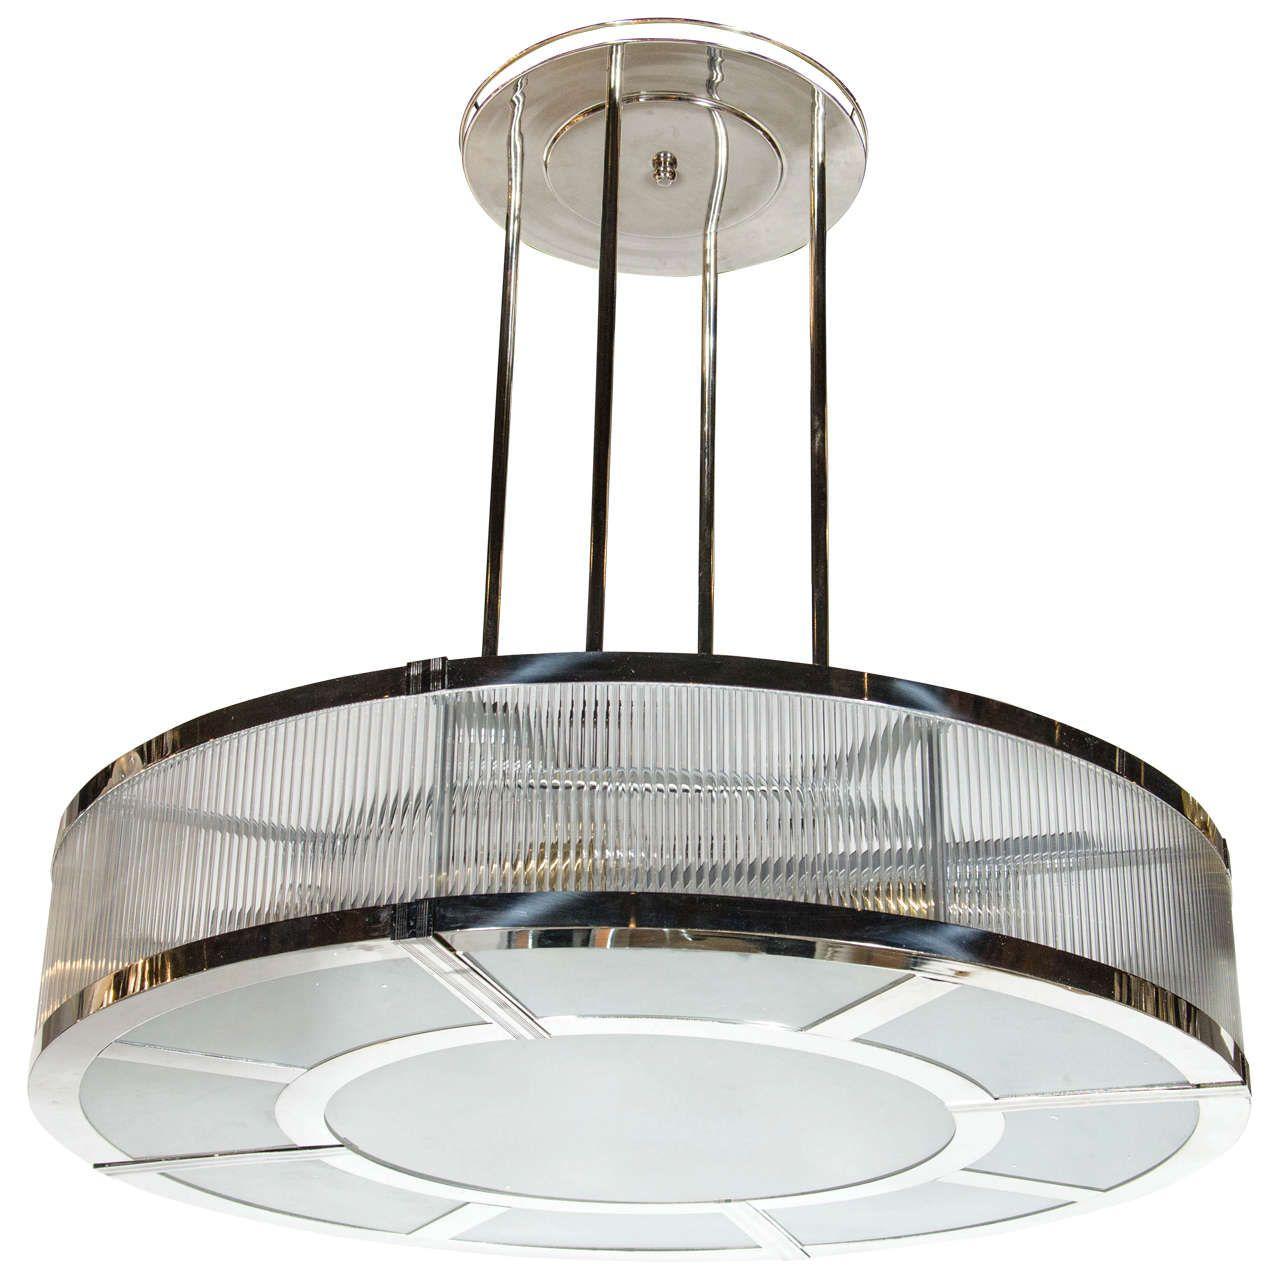 Streamline art deco style circular chandelier in polished nickel streamline art deco style circular chandelier in polished nickel glass arubaitofo Gallery